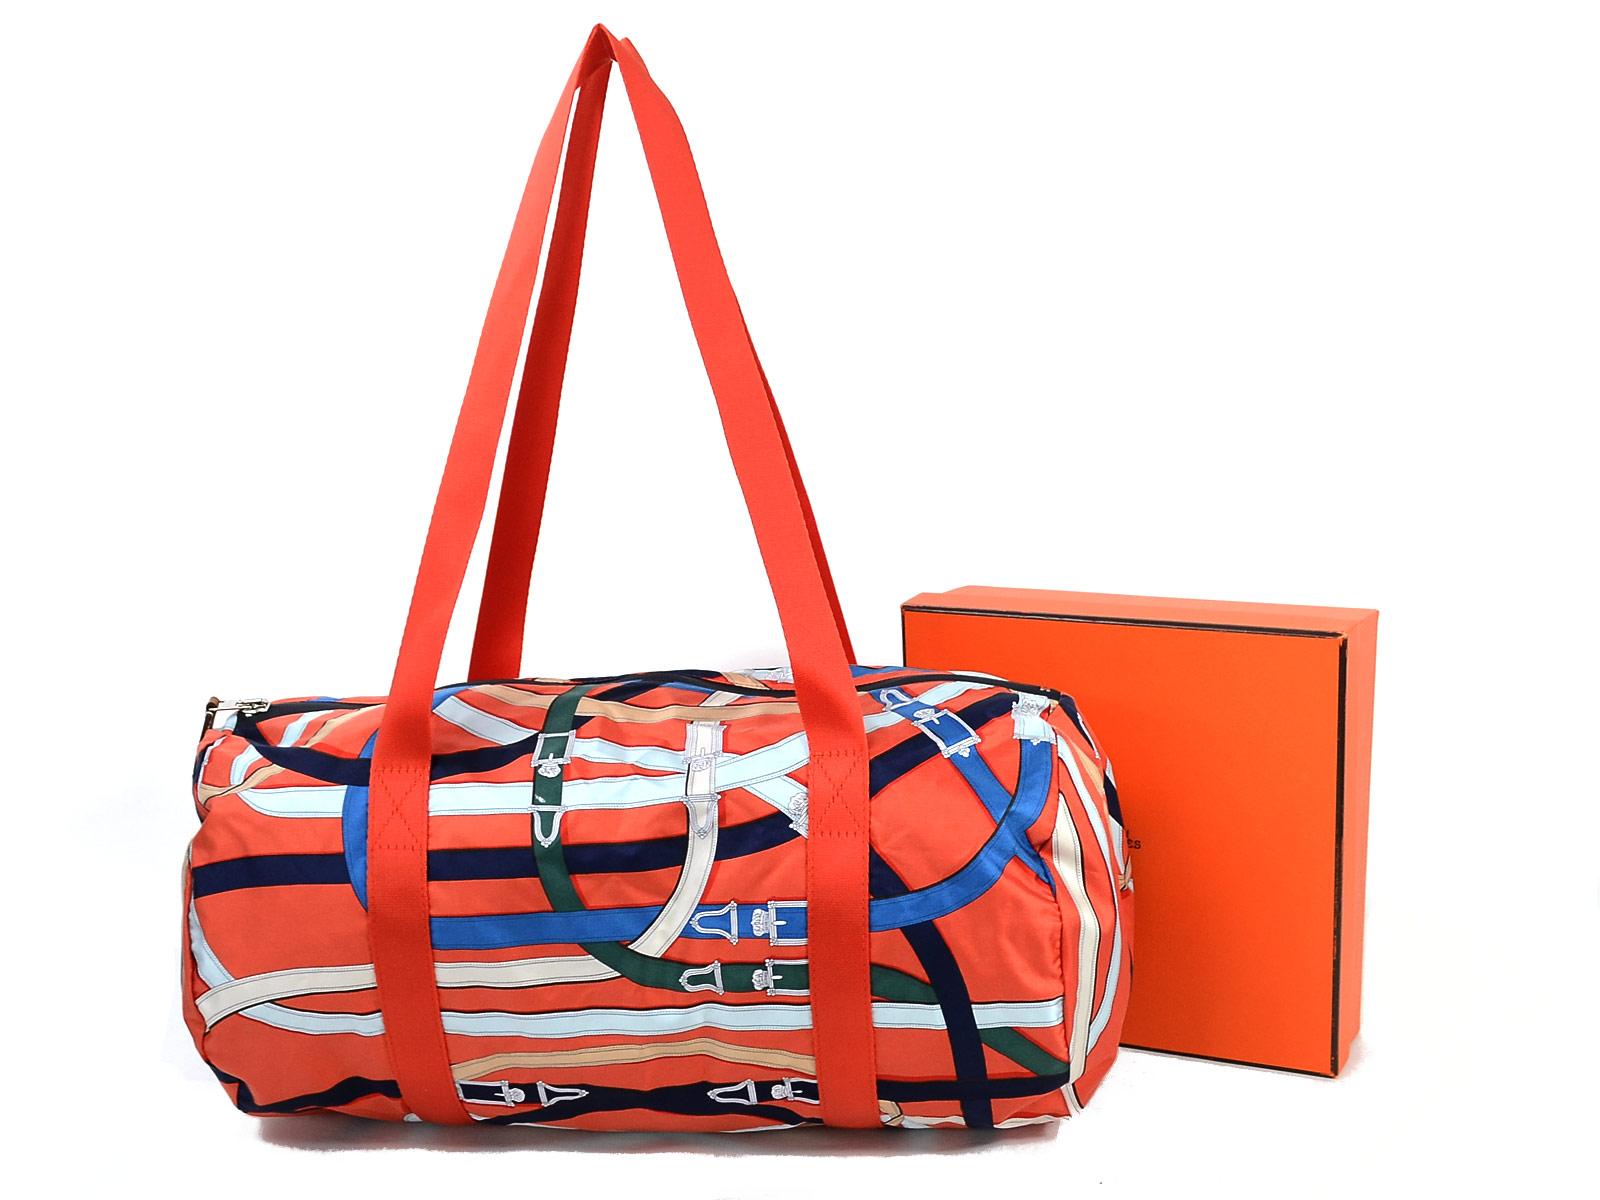 Auth Hermes A 2017 Airsilk Duffle 38 Shoulder Bag Orangemulticolor Silk 96928